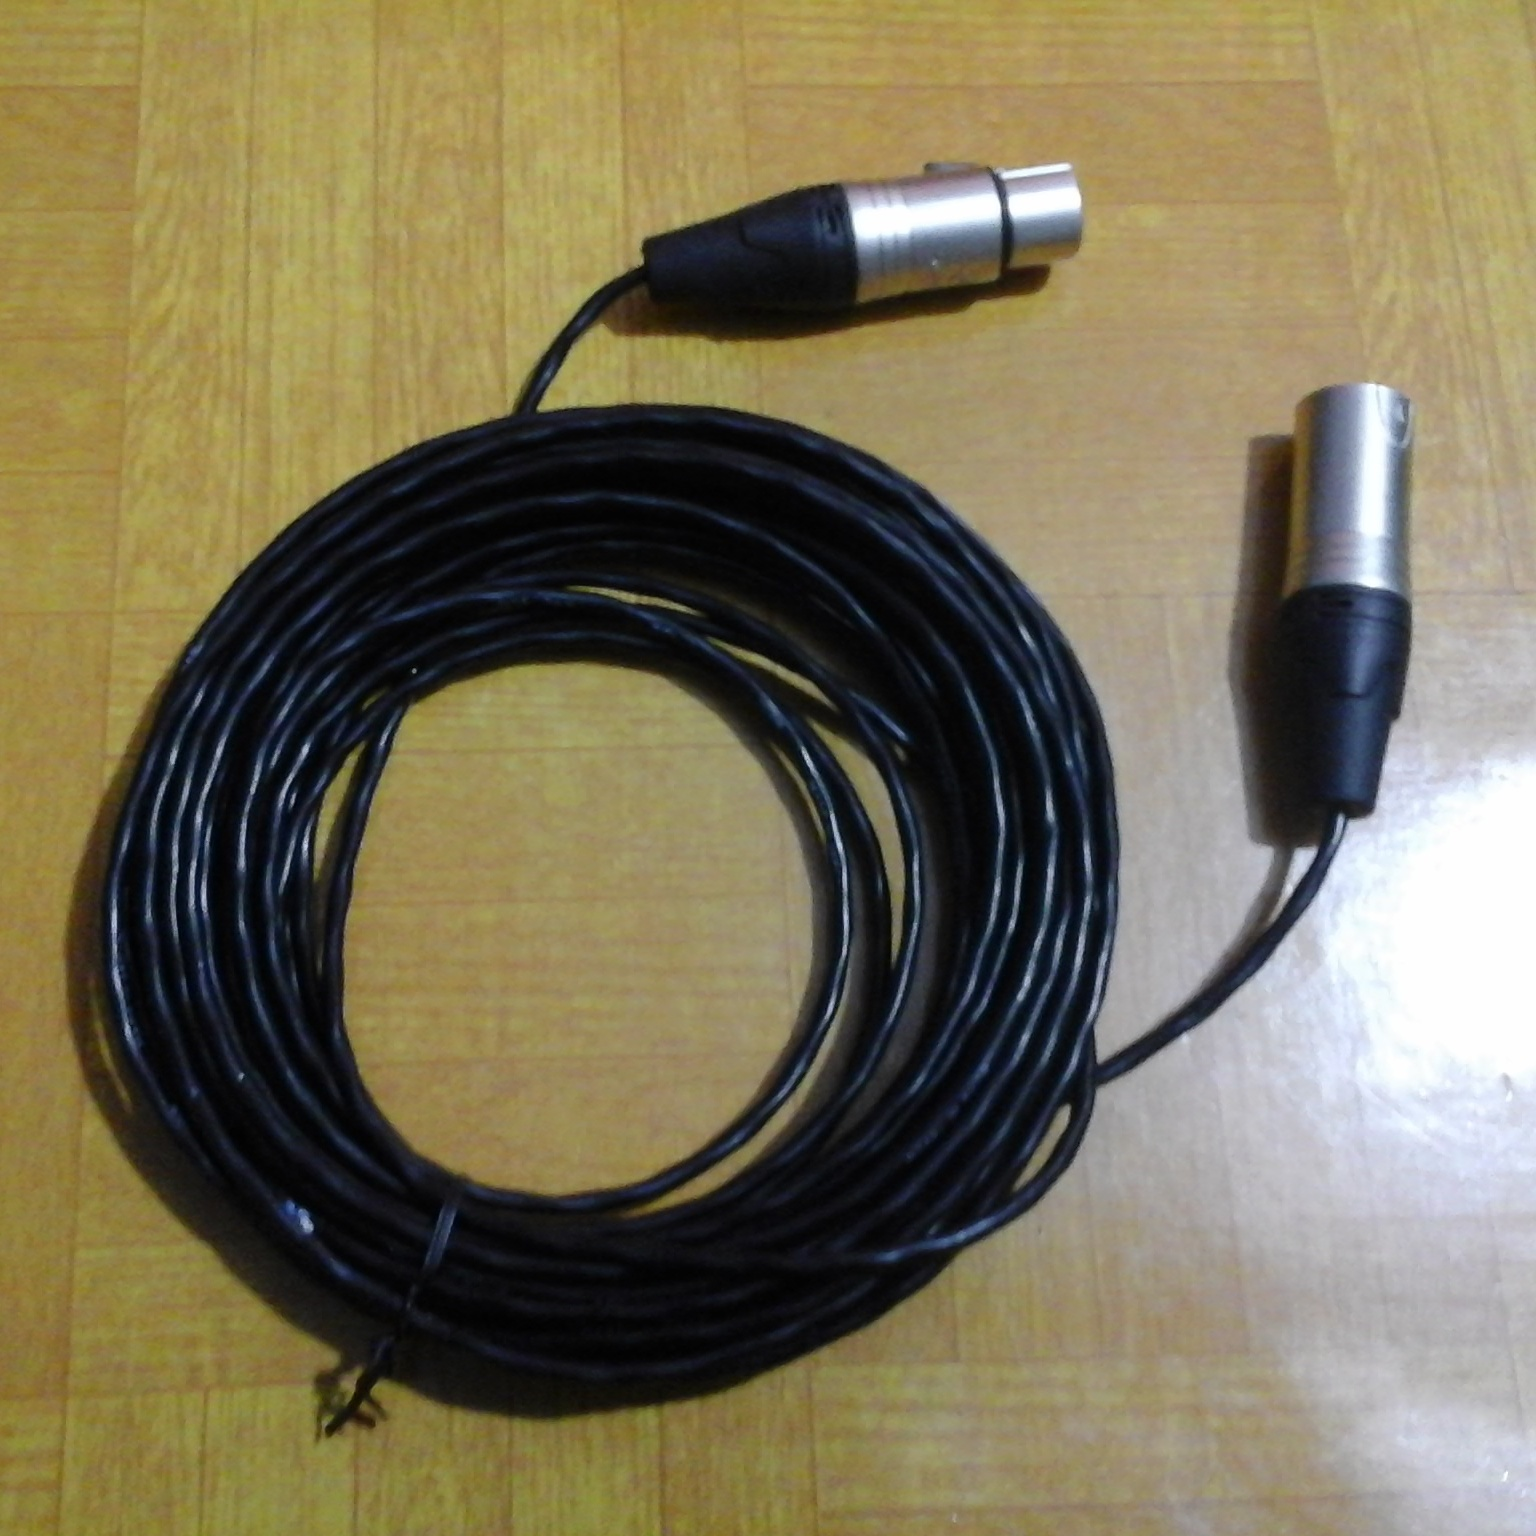 Sewa Kabel XLR Mirophone Jakarta Pusat, Selatan, Jakarta Barat, Jakarta Timur, Utara Hawila Multimedia